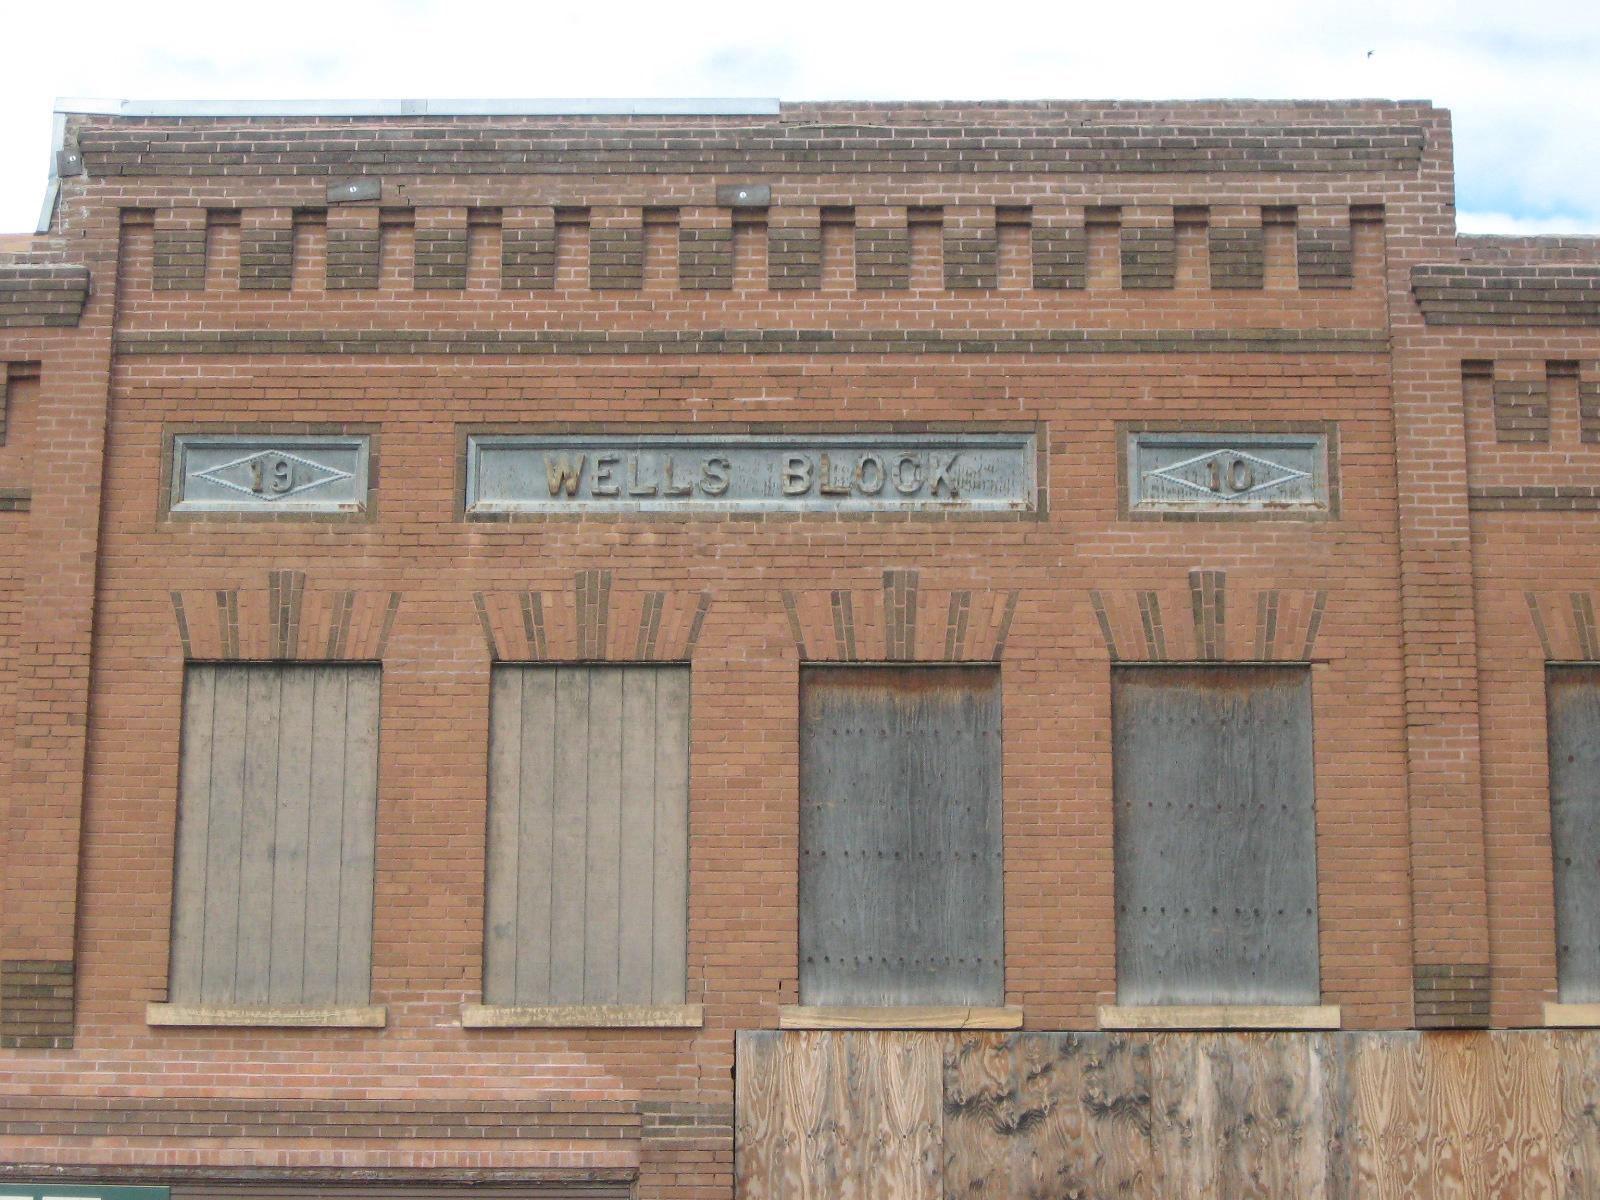 Wells Building Closeup - August 2014